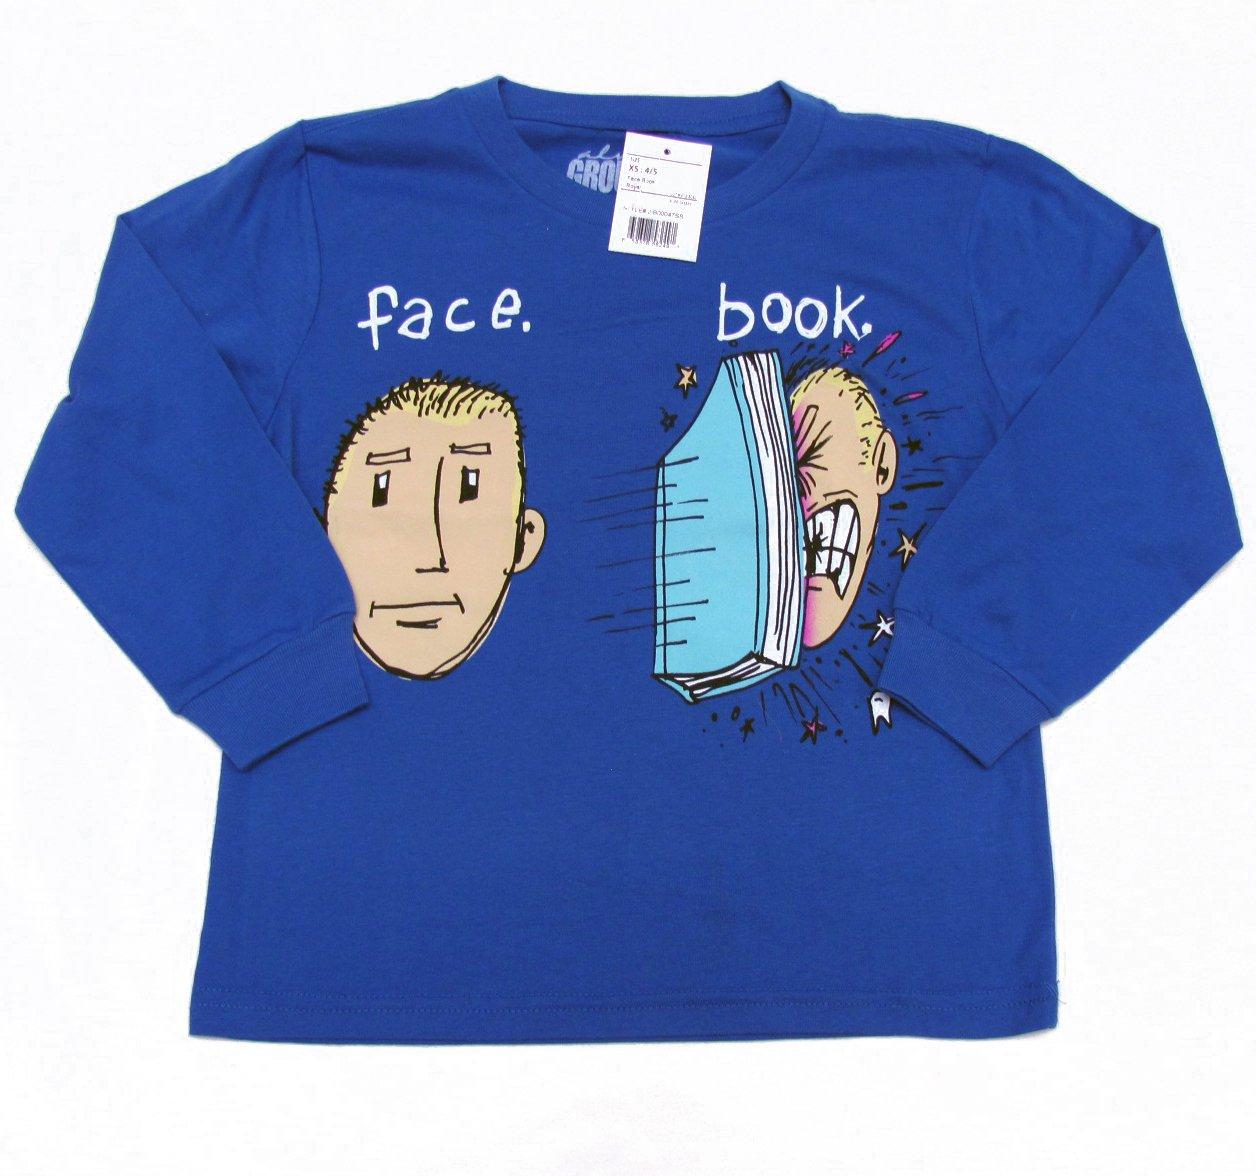 Always Grounded Boys size 7X-8 Funny Facebook T-shirt Blue Long Sleeve Tee Shirt Face Book